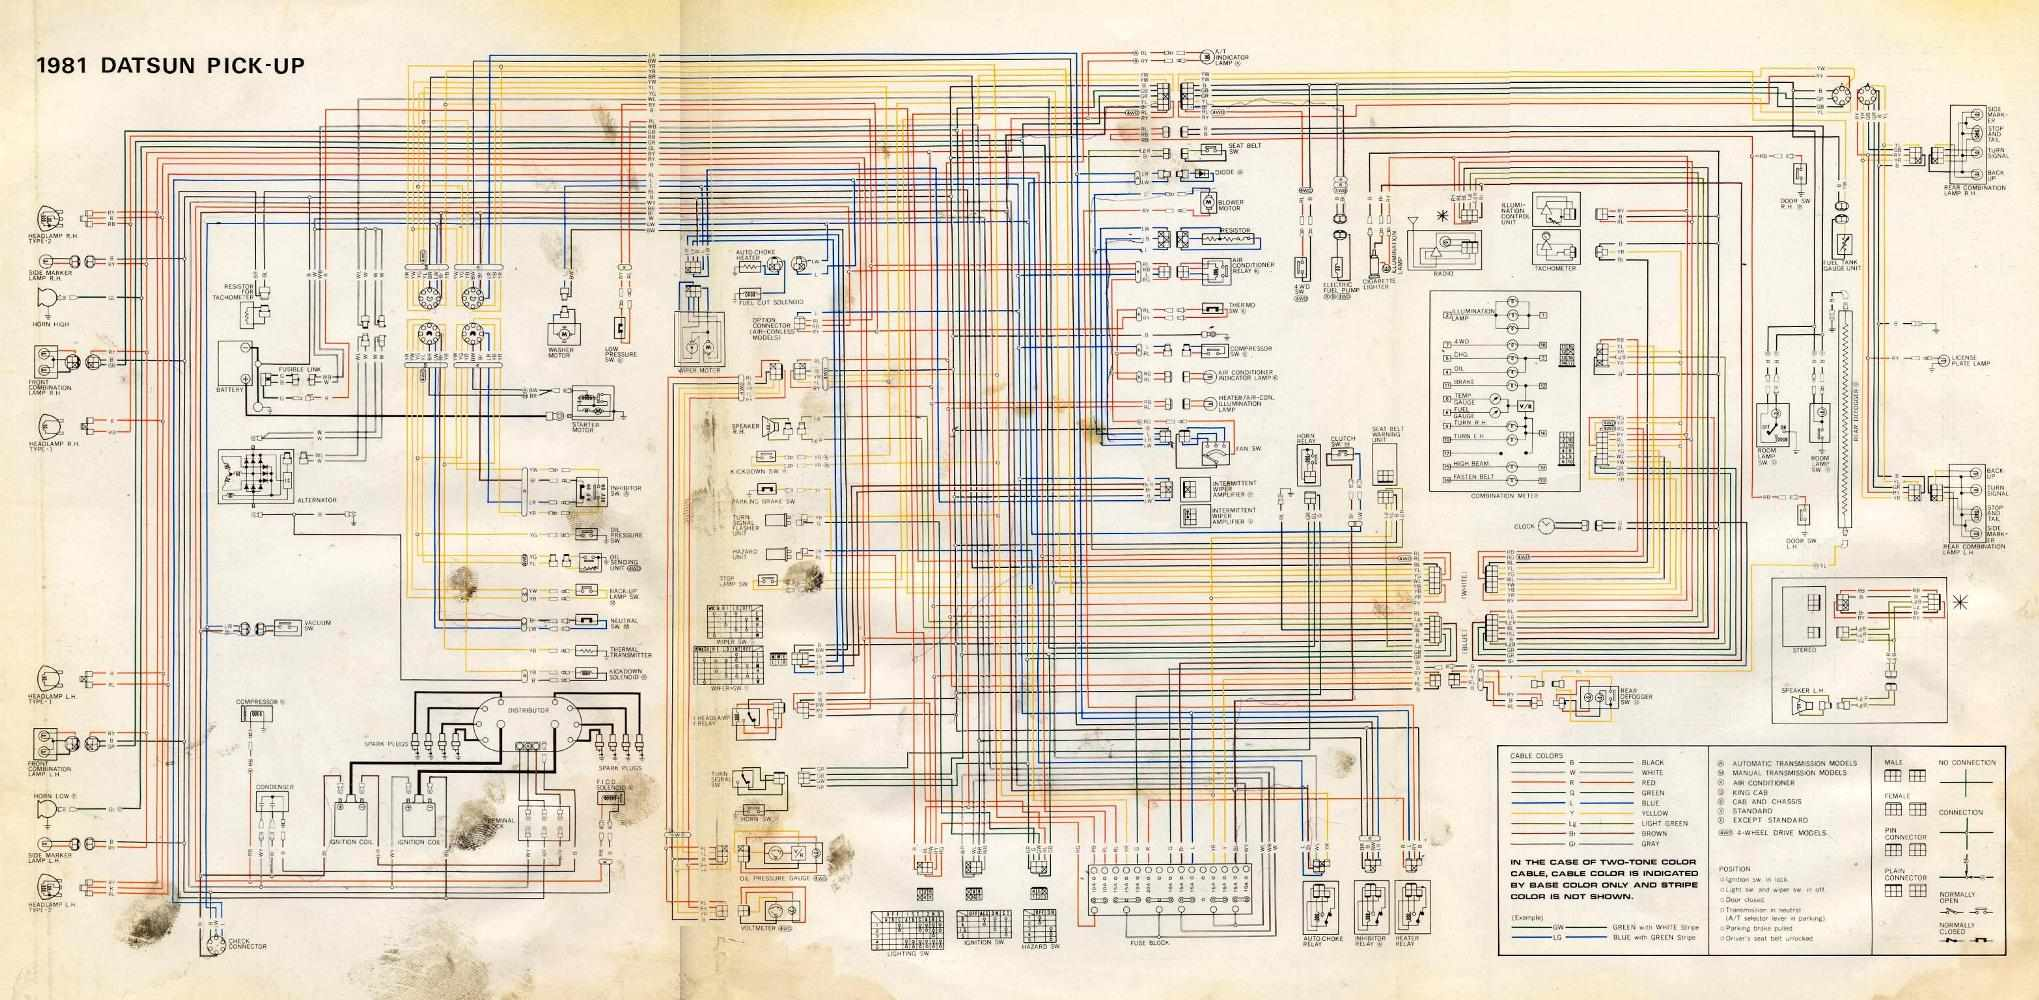 1999 Bluebird Wiring Diagram - Library Of Wiring Diagrams •